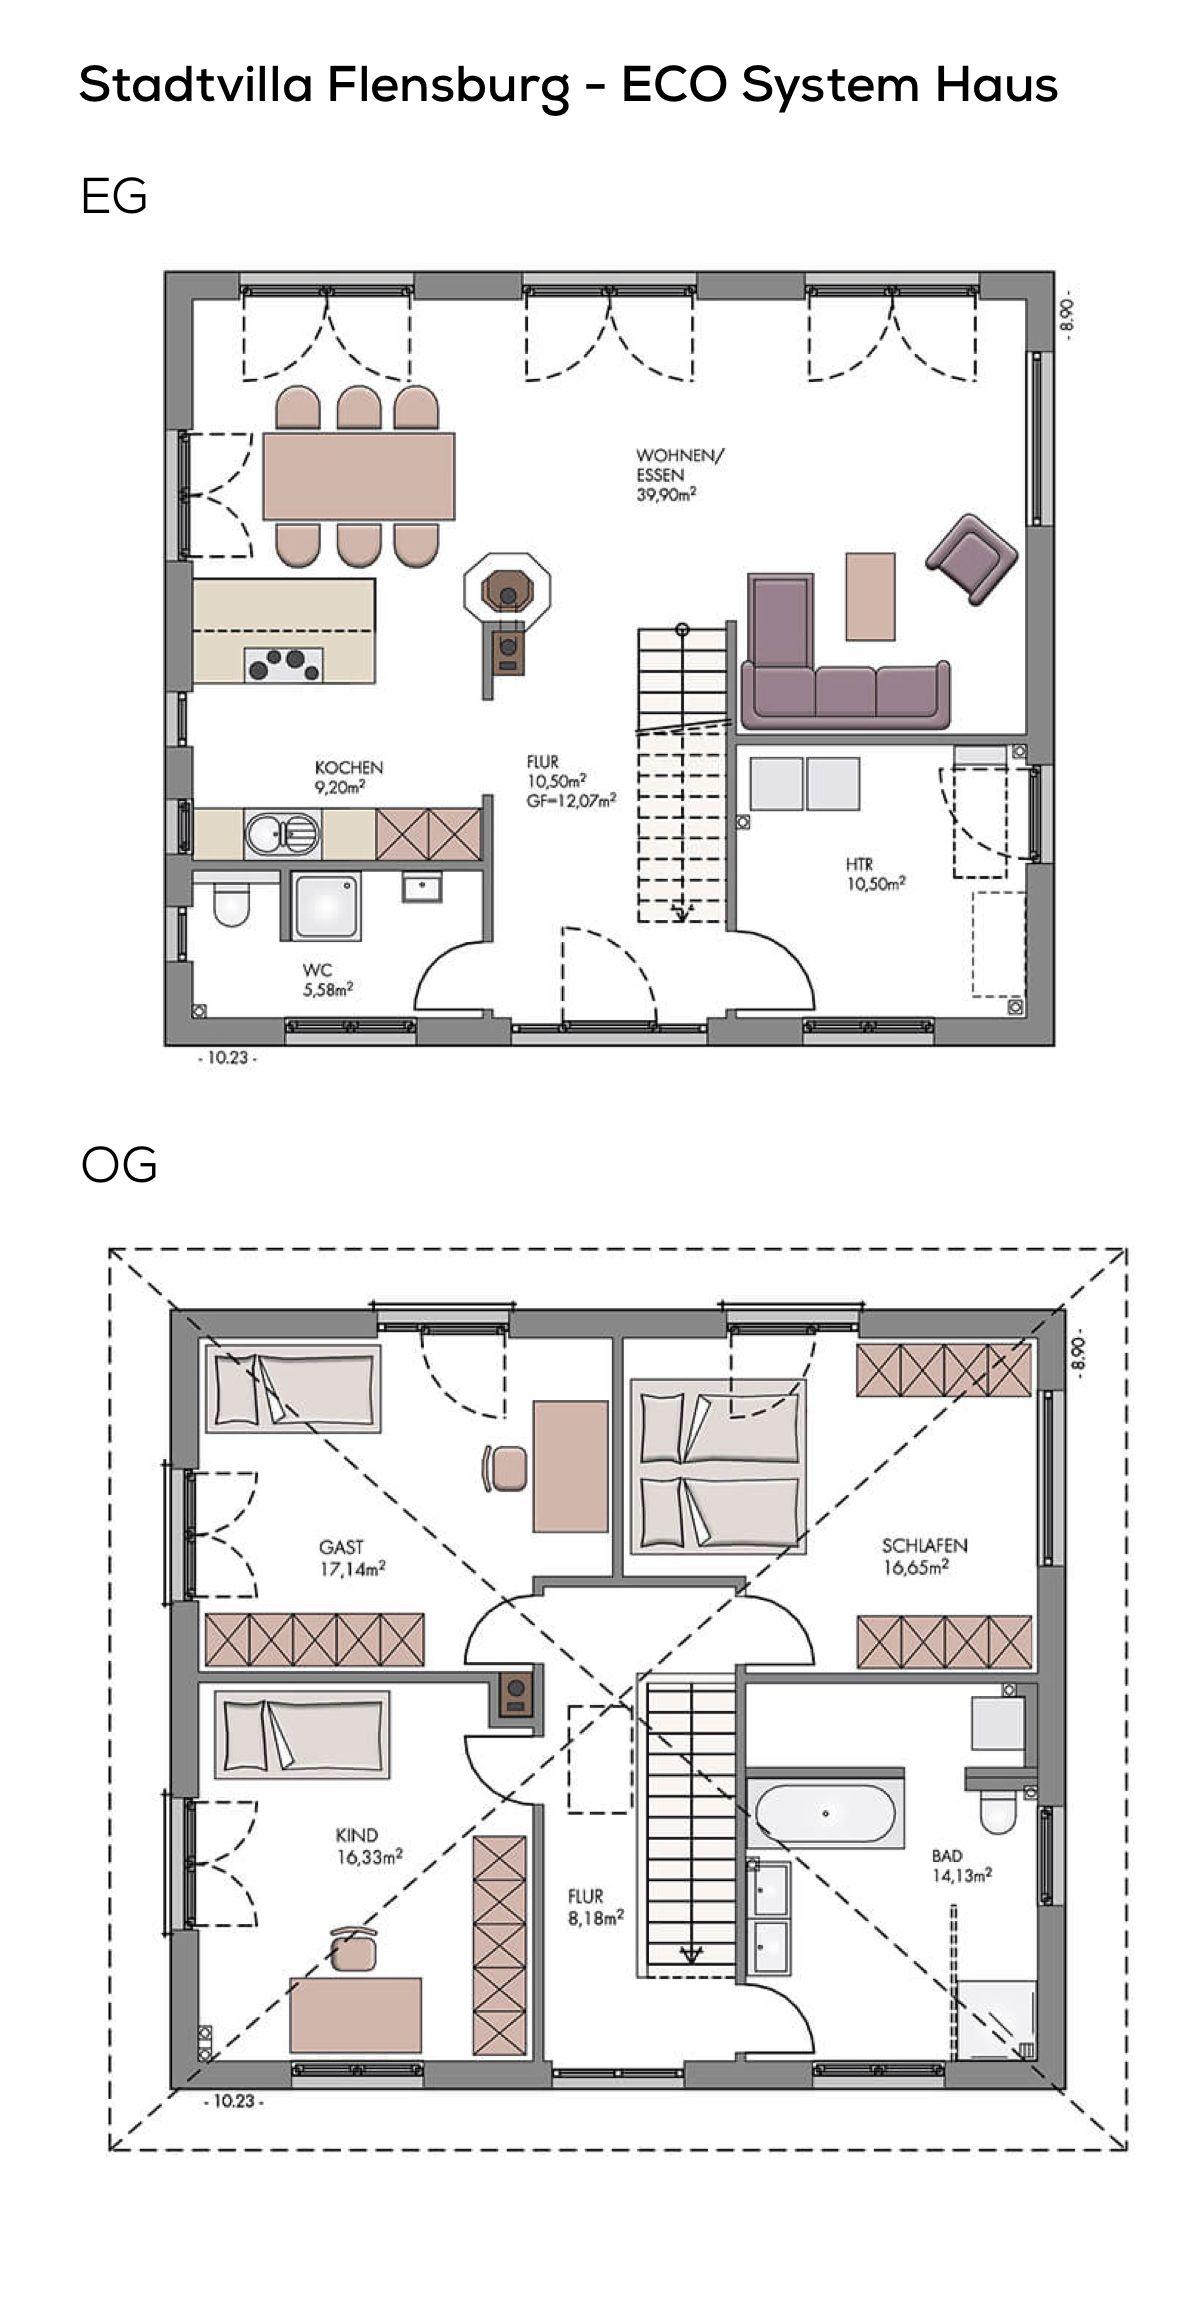 Stadtvilla Grundriss Modern Mit Kamin Zeltdach Architektur 4 Zimmer 150 Qm Wohnflache Erdgeschoss Kuche Offe Grundriss Einfamilienhaus Haus Hausbau Ideen